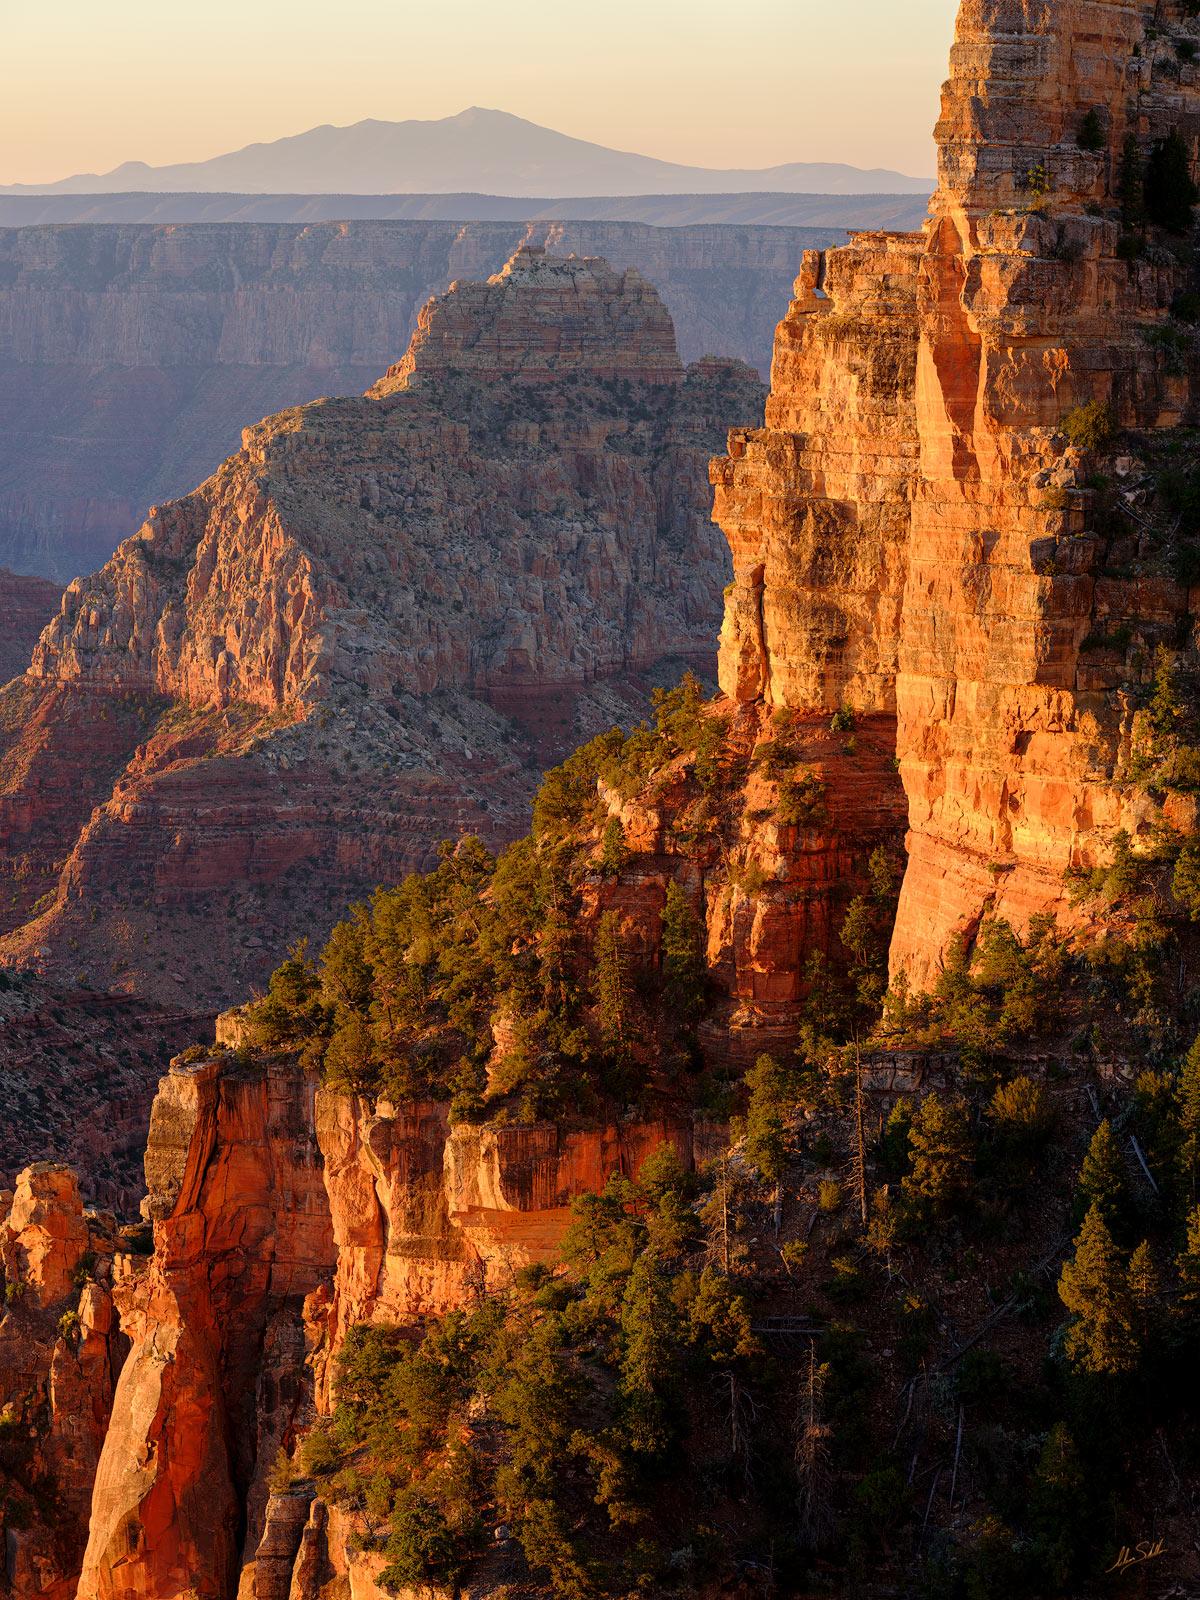 AZ, Arizona, Fuji, FujiFilm, GFX 50R, Grand Canyon, National Park, North Rim, San Francisco Peaks, Vishnu Temple, Walhalla Plateau, photo